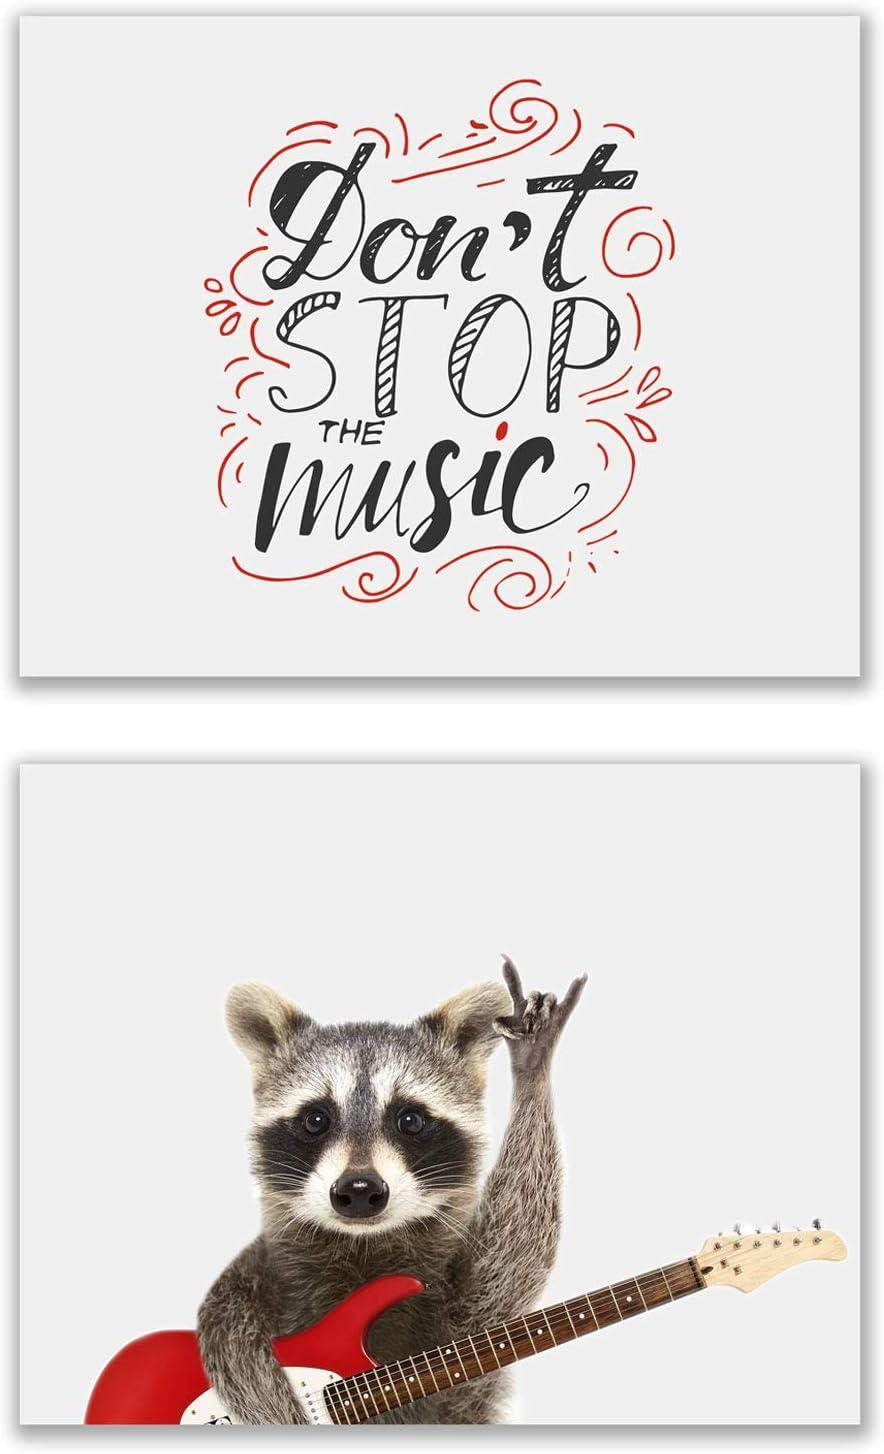 Rocker Raccoon Poster Prints - Set of 2 (11x14) Glossy Cute Red Funny Guitar Music Animal Photography Wall Art Decor